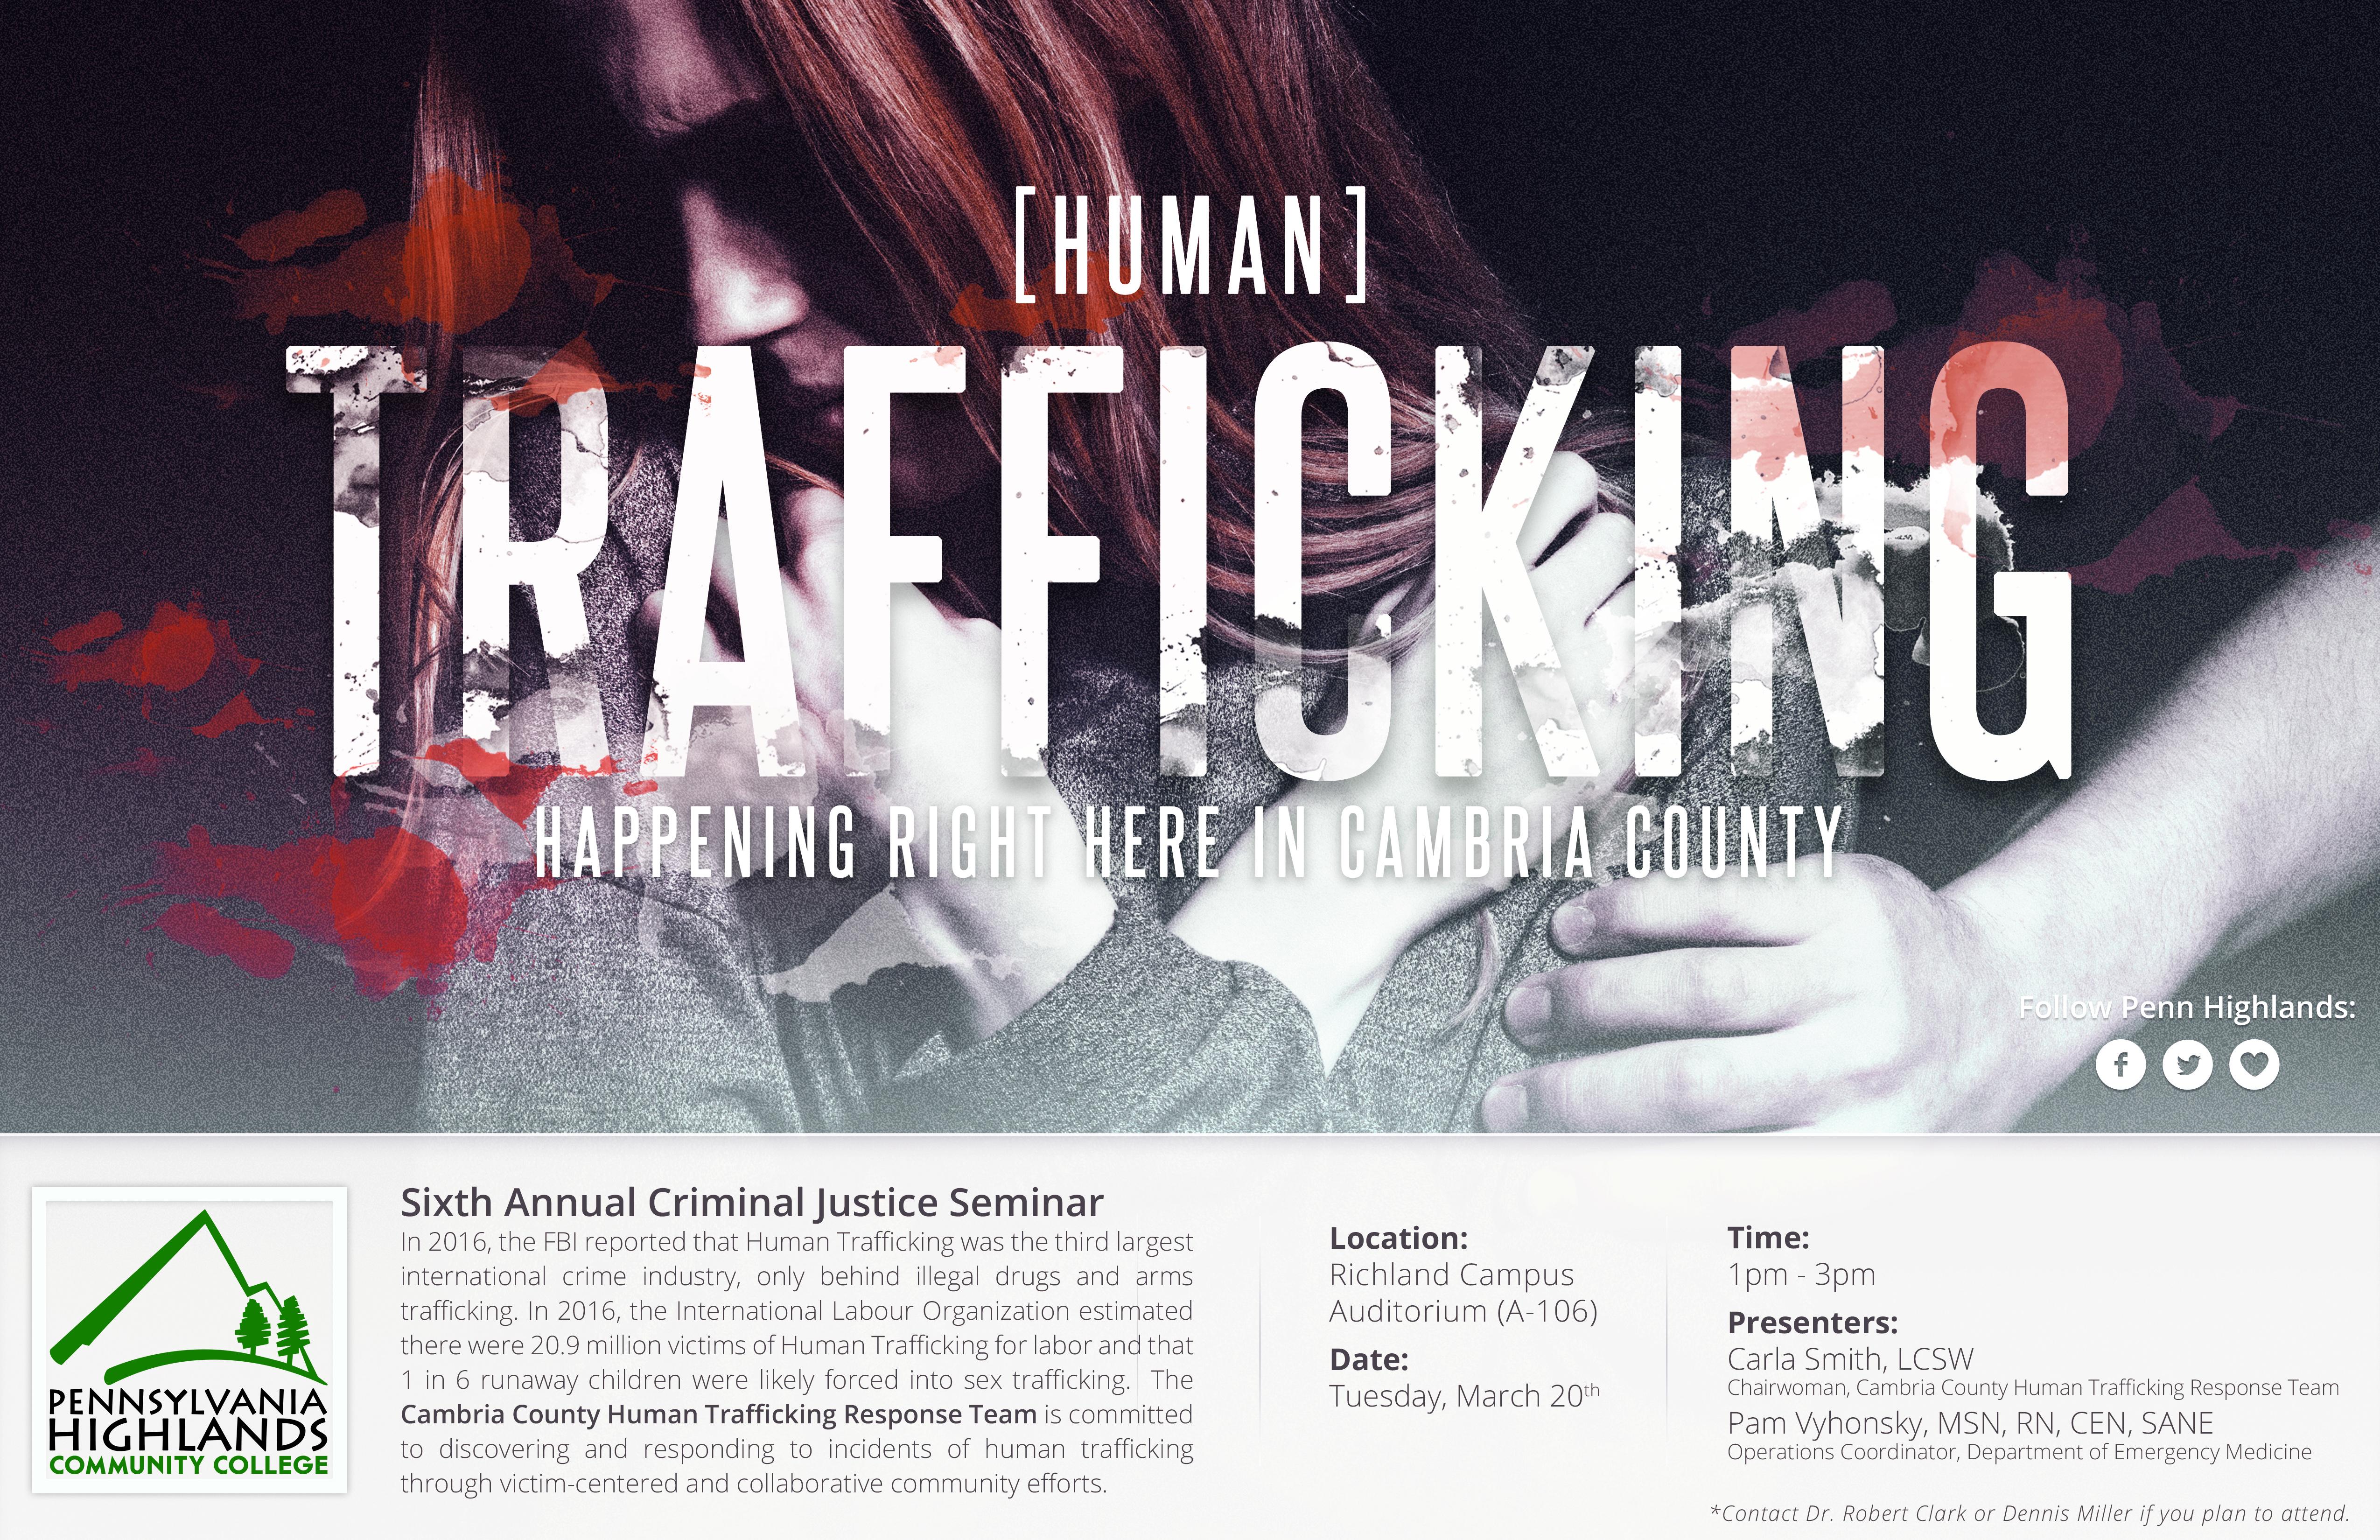 Sixth Annual Criminal Justice Seminar Flyer